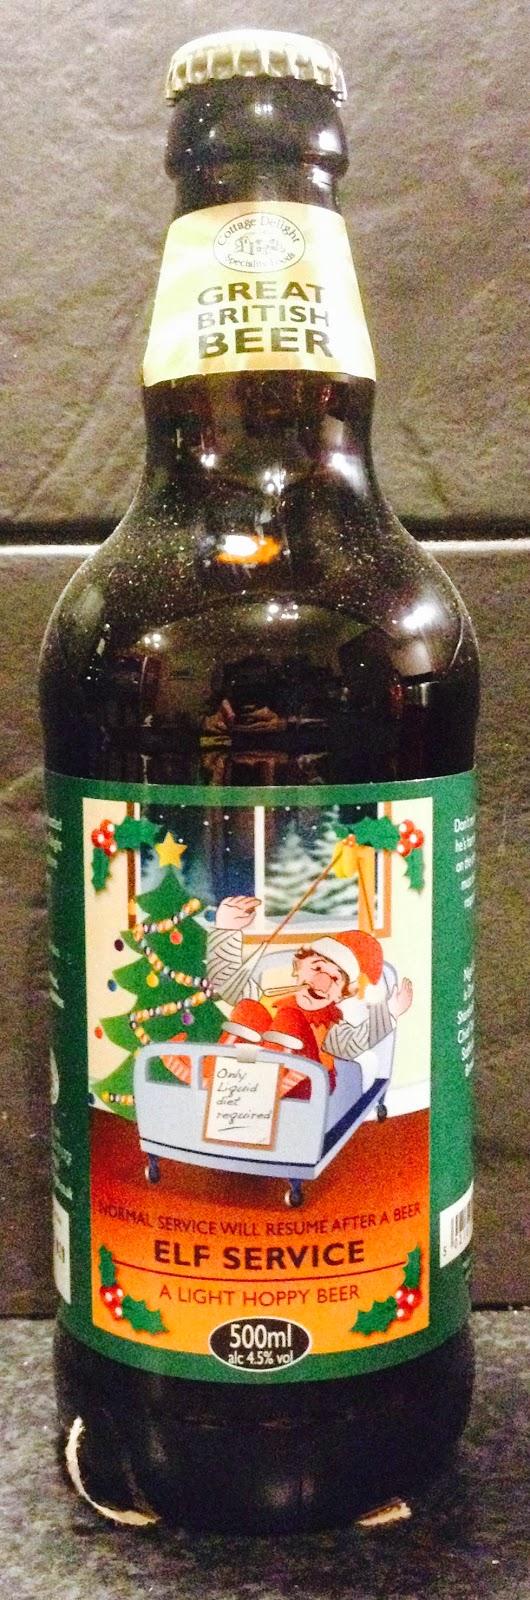 Elf Service (Staffordshire Brewery)